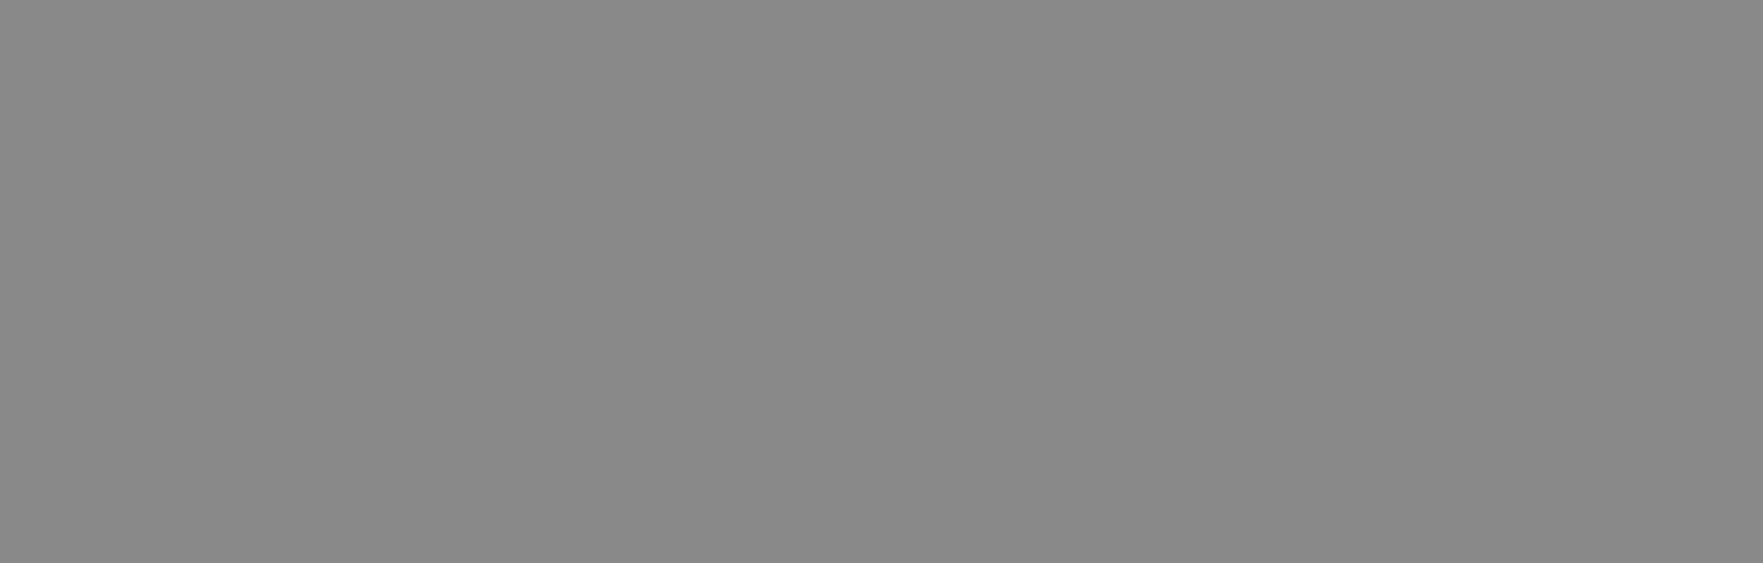 rb marks construction logo